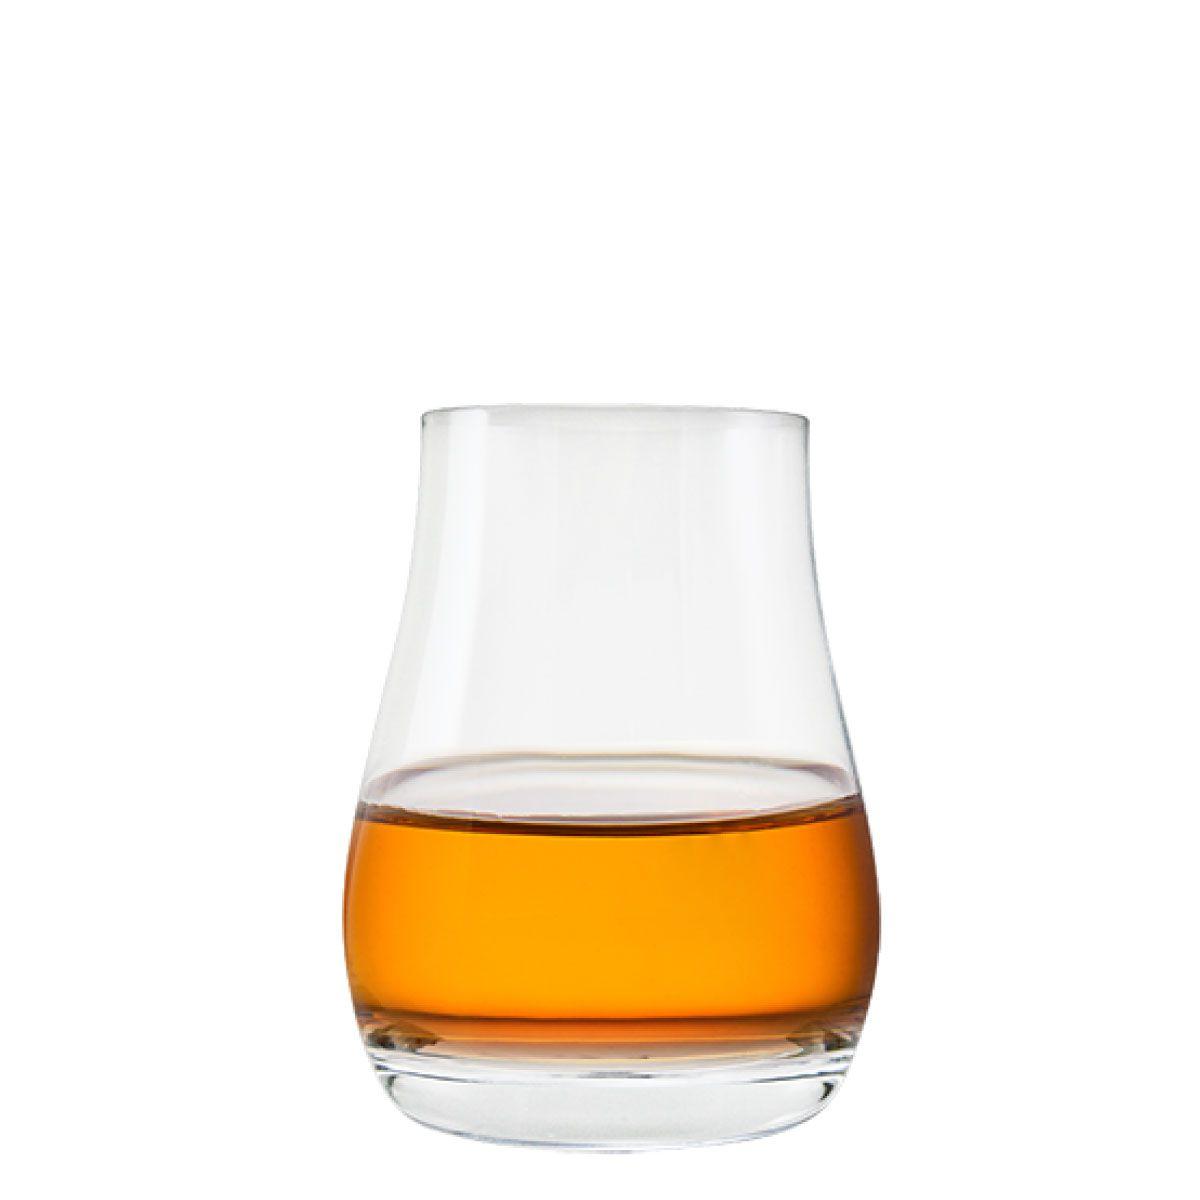 Copo Whisky Degustação 150ml 6 pcs